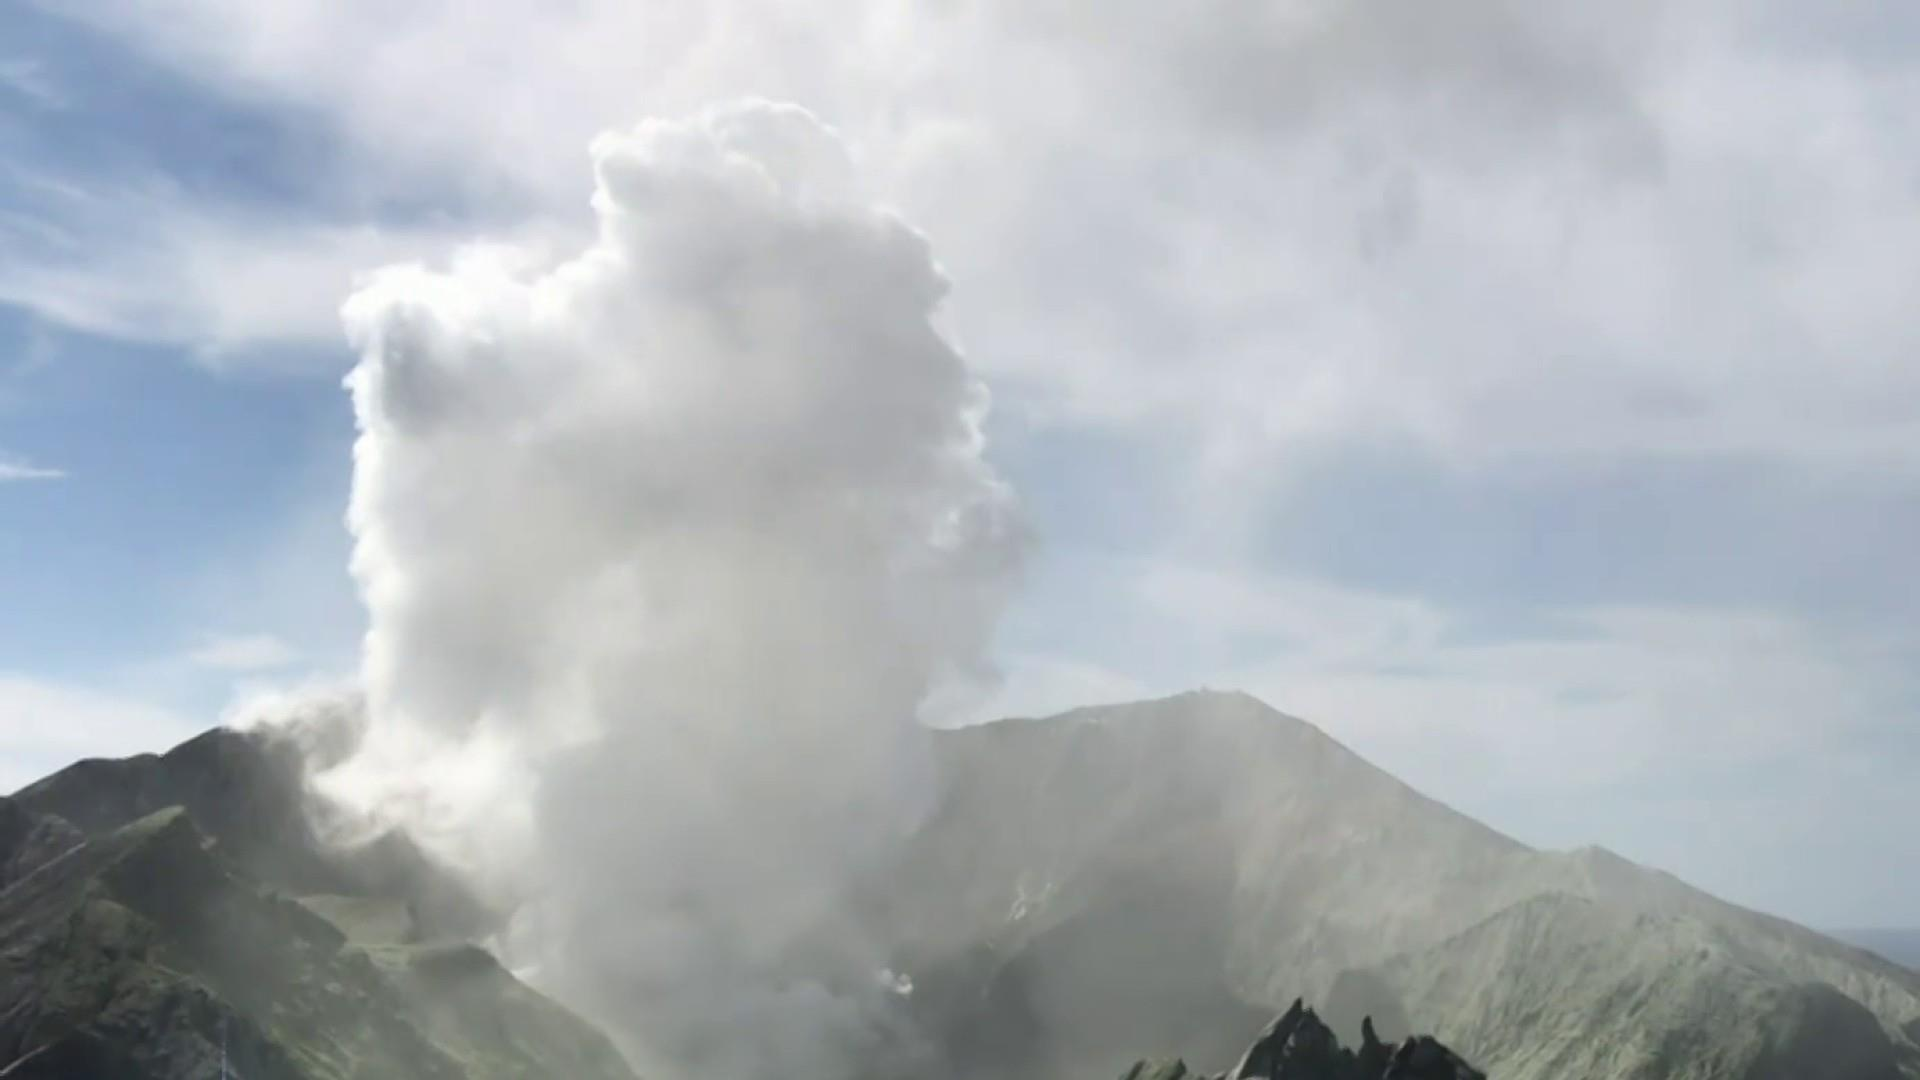 American couple on honeymoon in New Zealand severely burned in volcano eruption